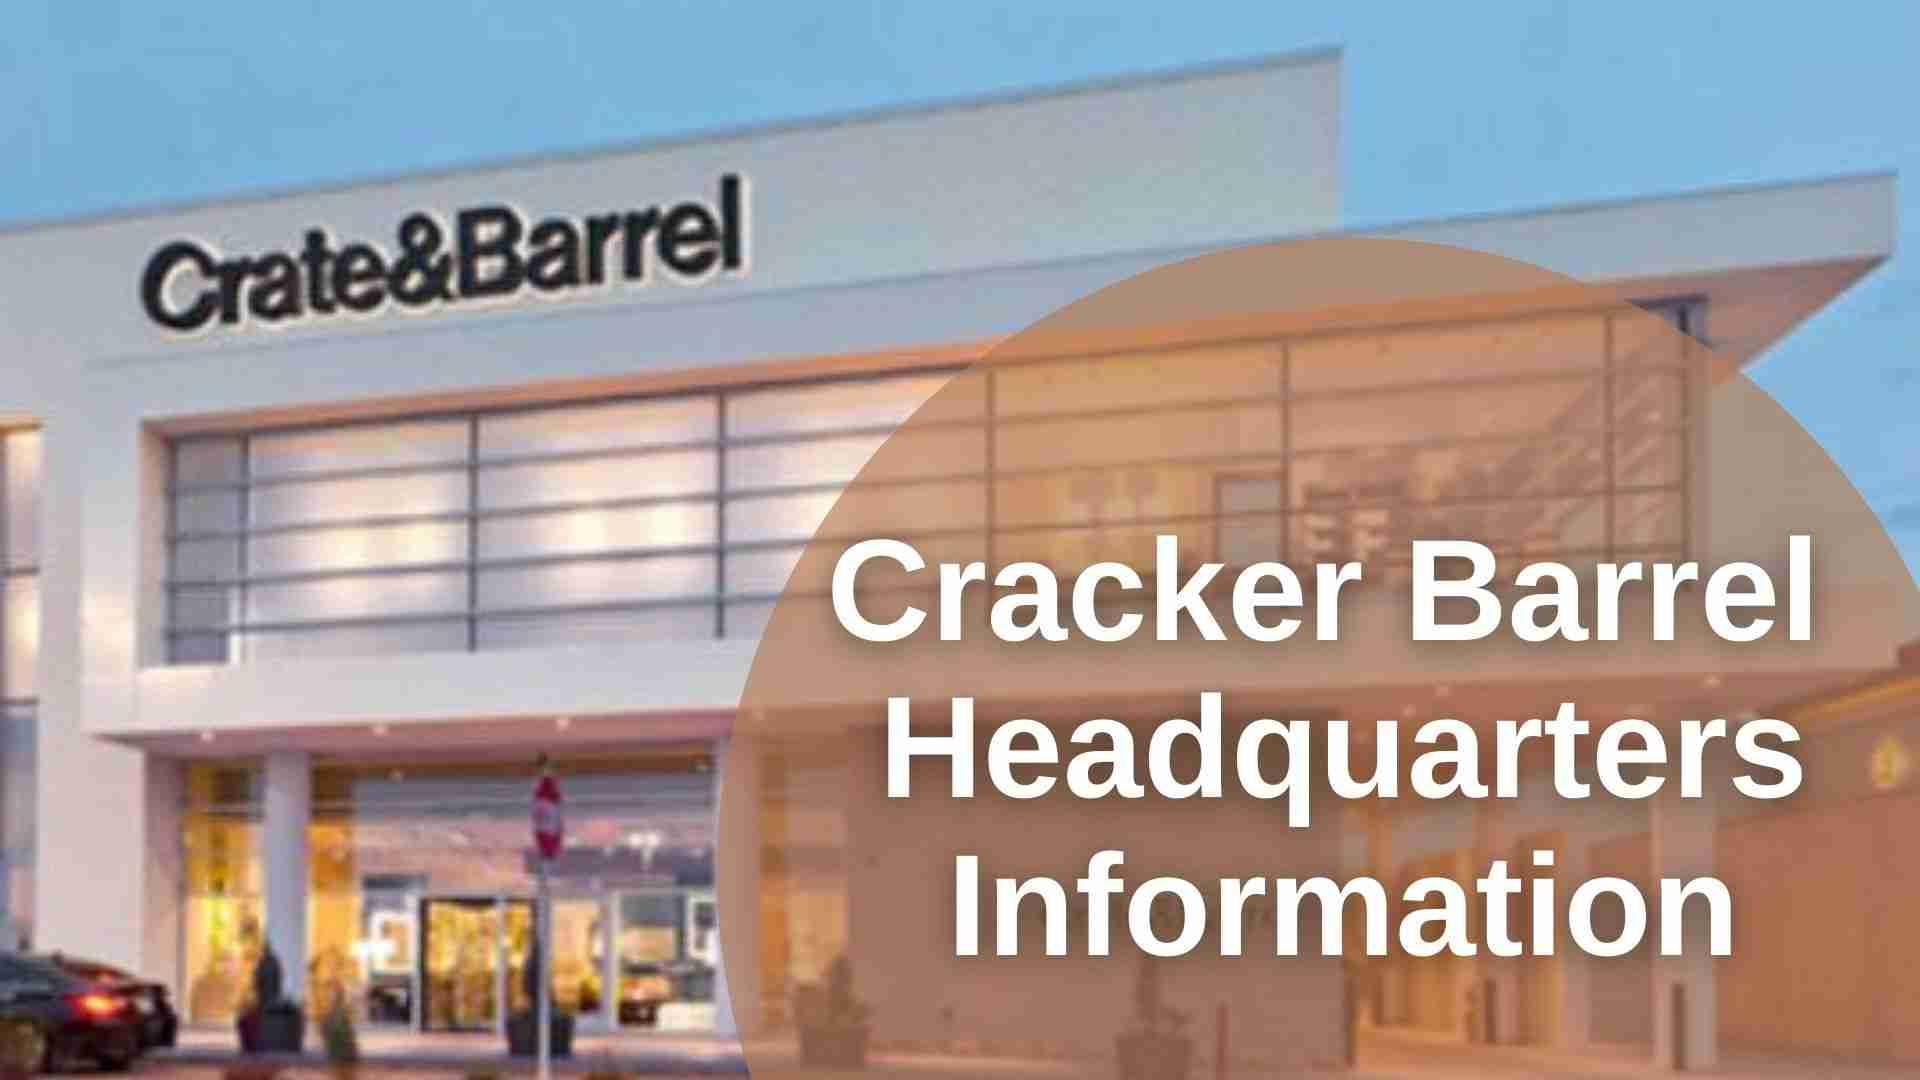 Cracker Barrel Headquarters Information